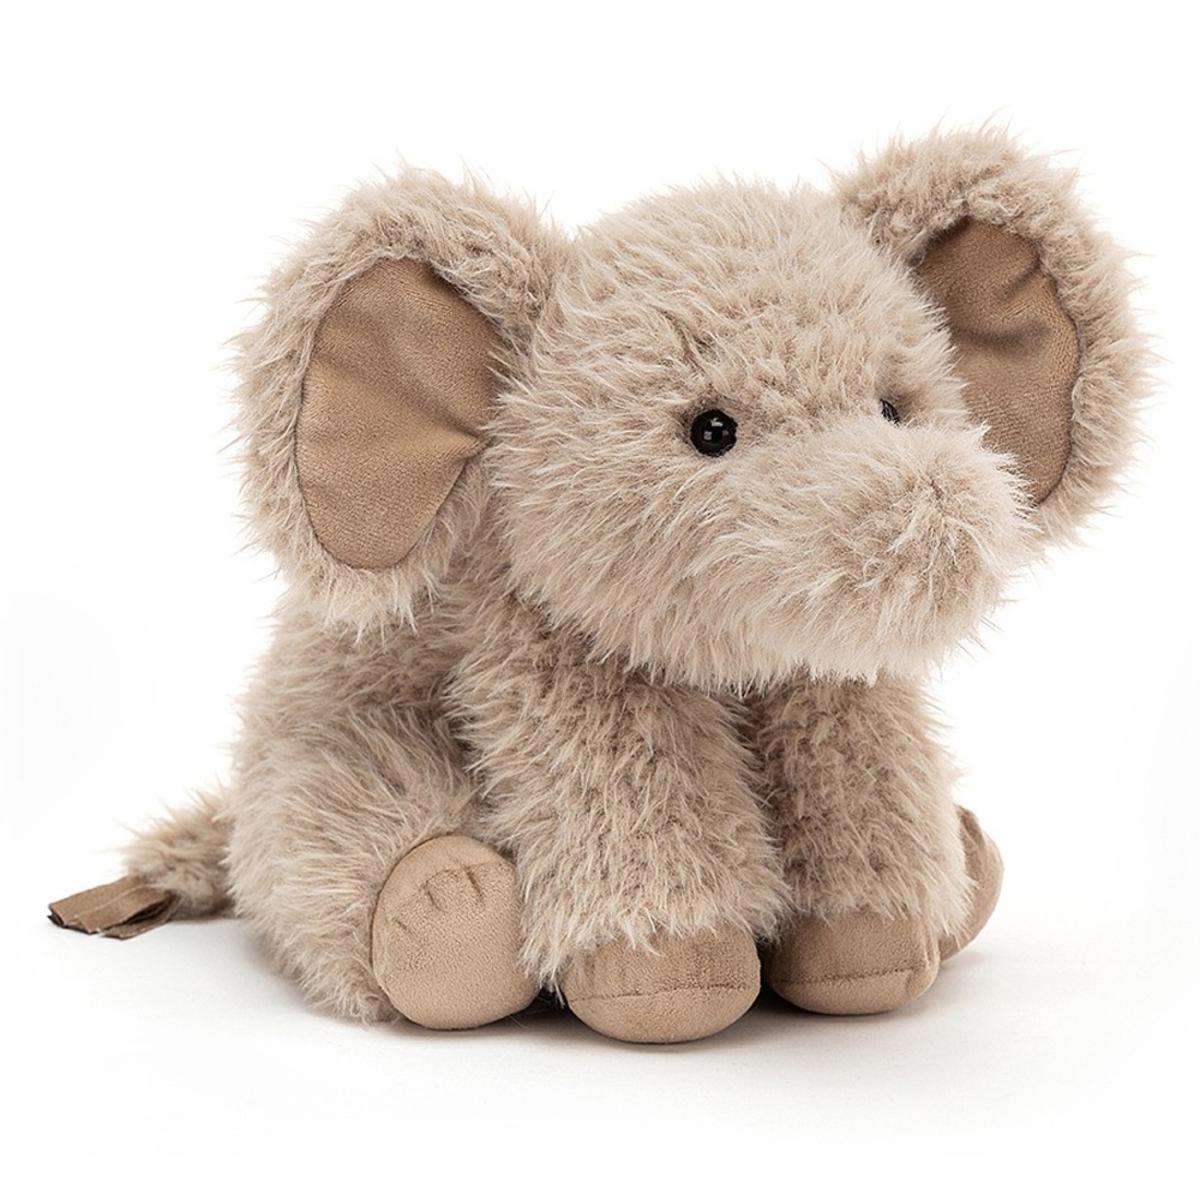 Peluche Curvie Elephant - Medium Peluche Eléphant 24 cm